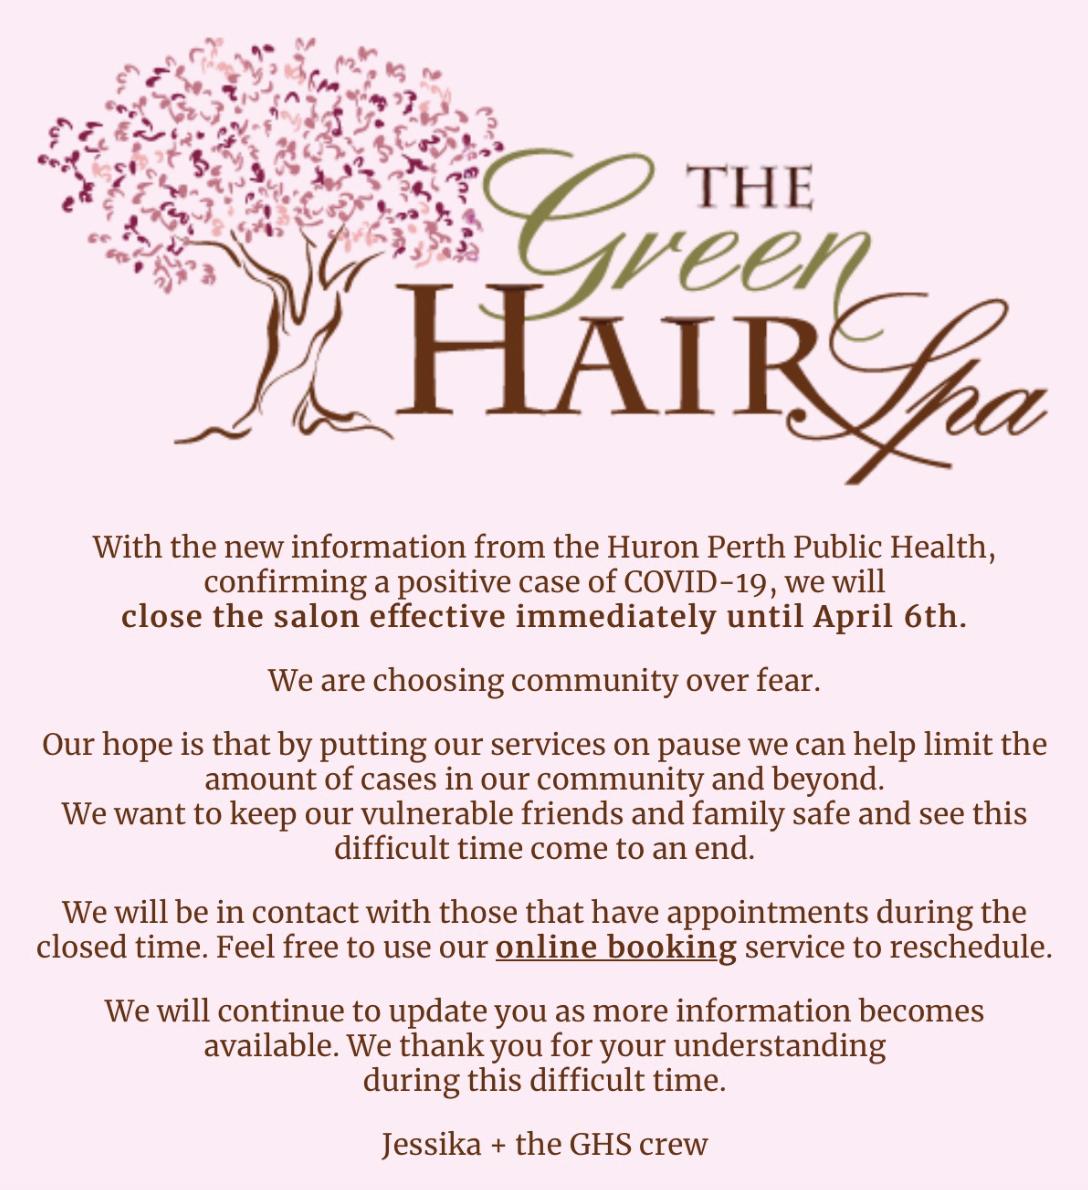 The Green Hair Spa COVID-19 Update